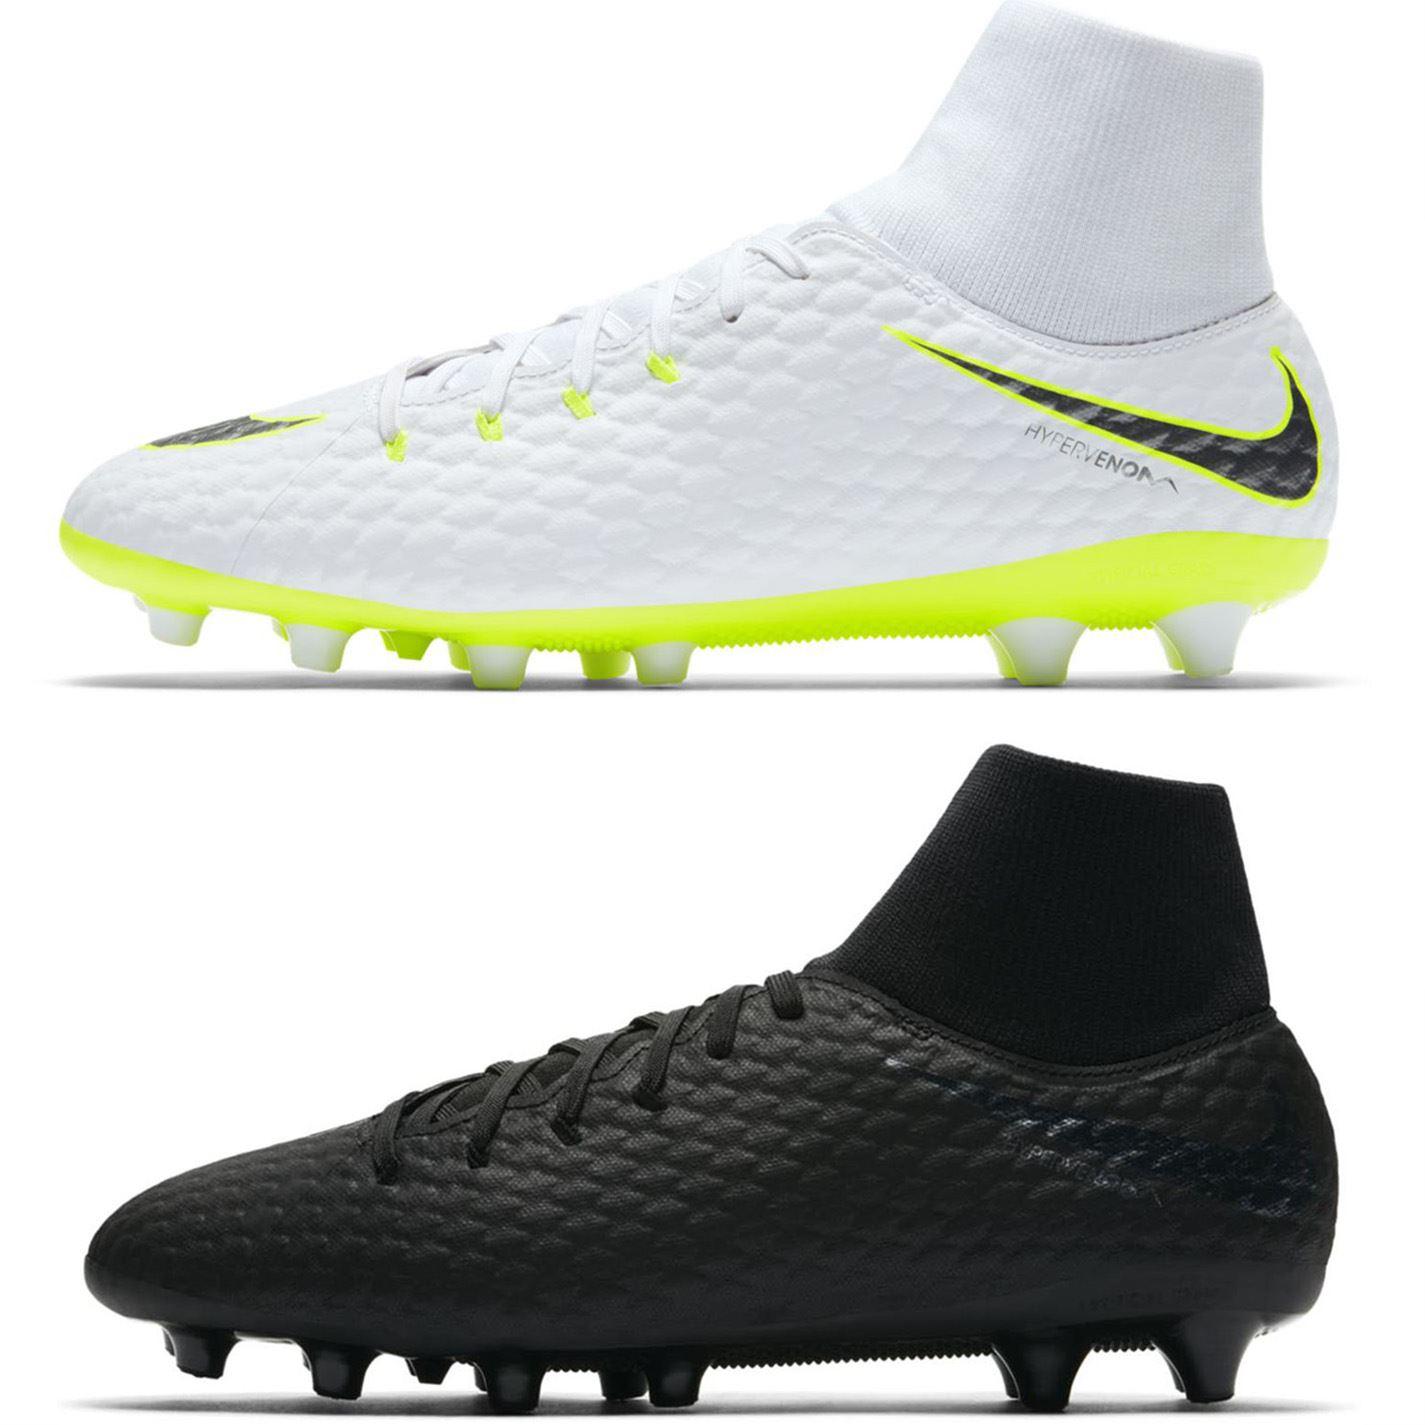 half off 19c56 d9d6c ... Nike Hypervenom Phantom 3 Academy DF AG Football Boots Mens Soccer Shoes  Cleats ...